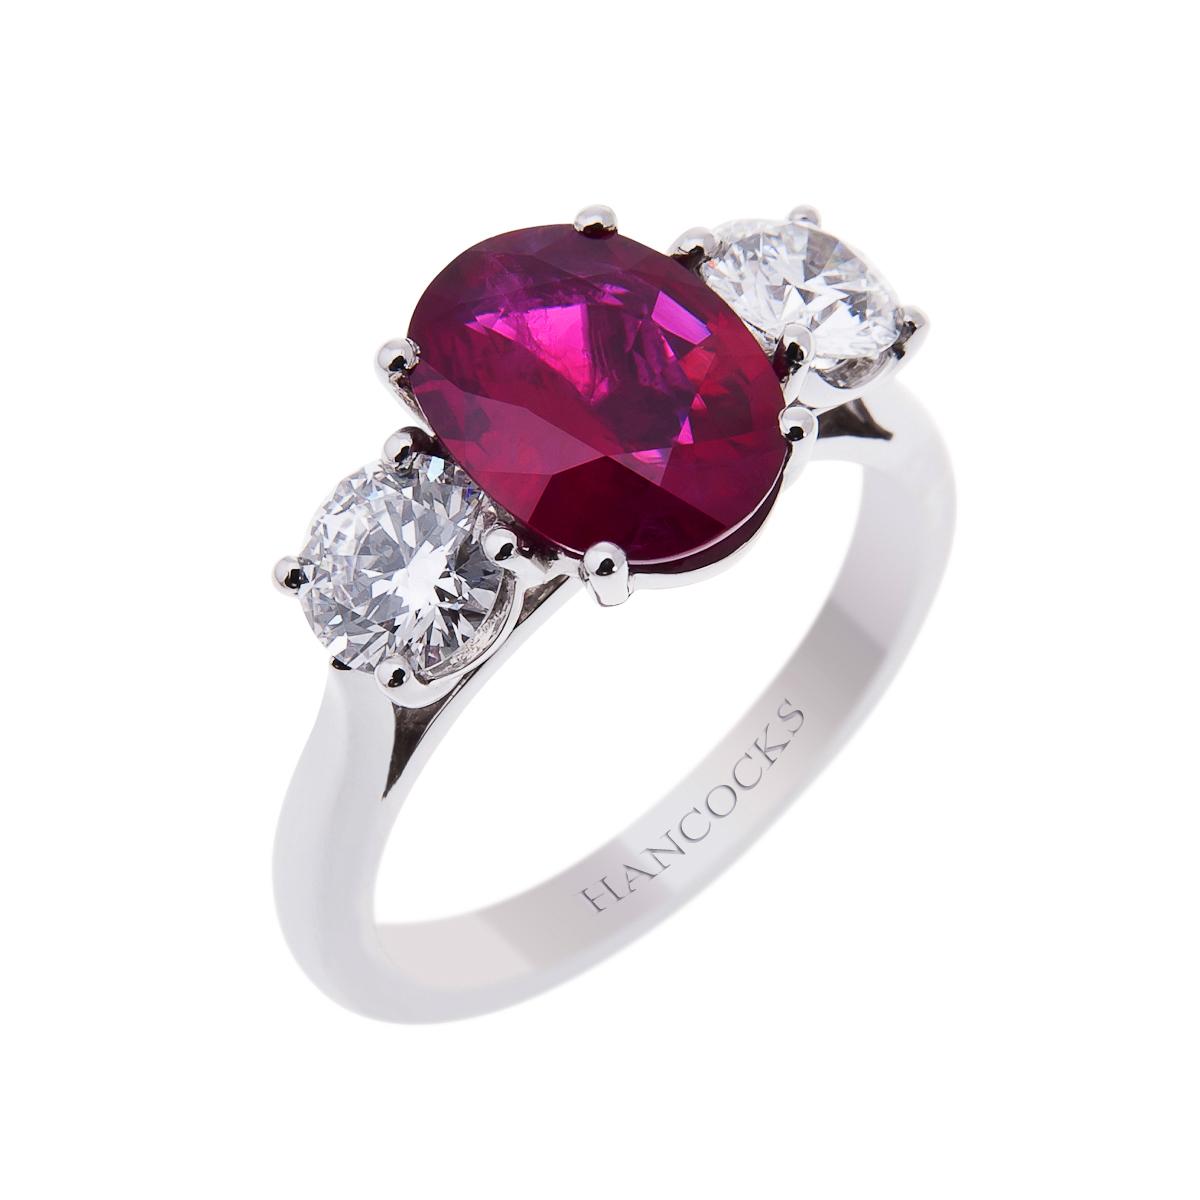 Ruby And Diamond 3 Stone Ring Hancocks Jewellers